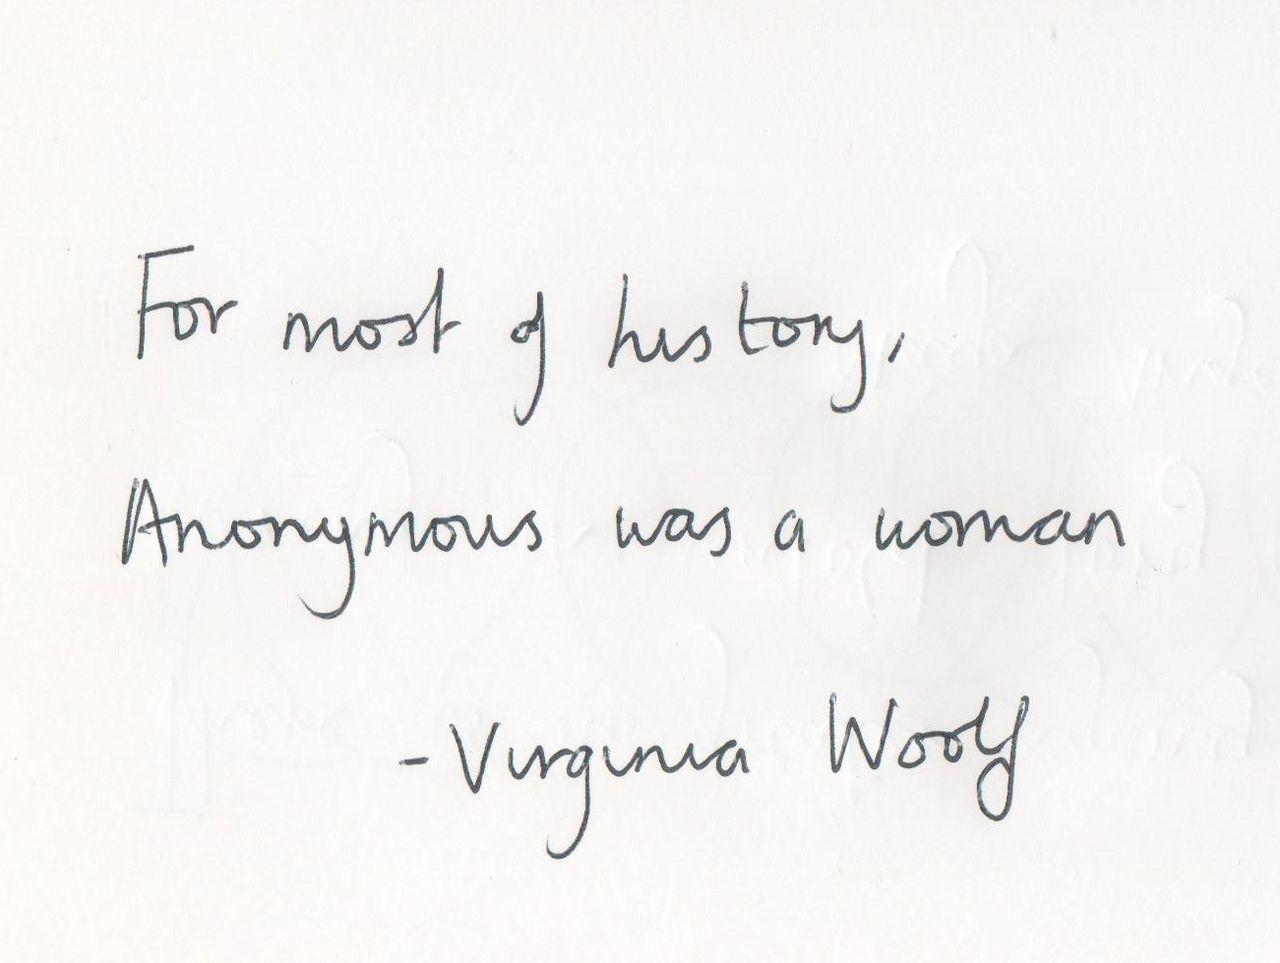 virginia woolf feminist works